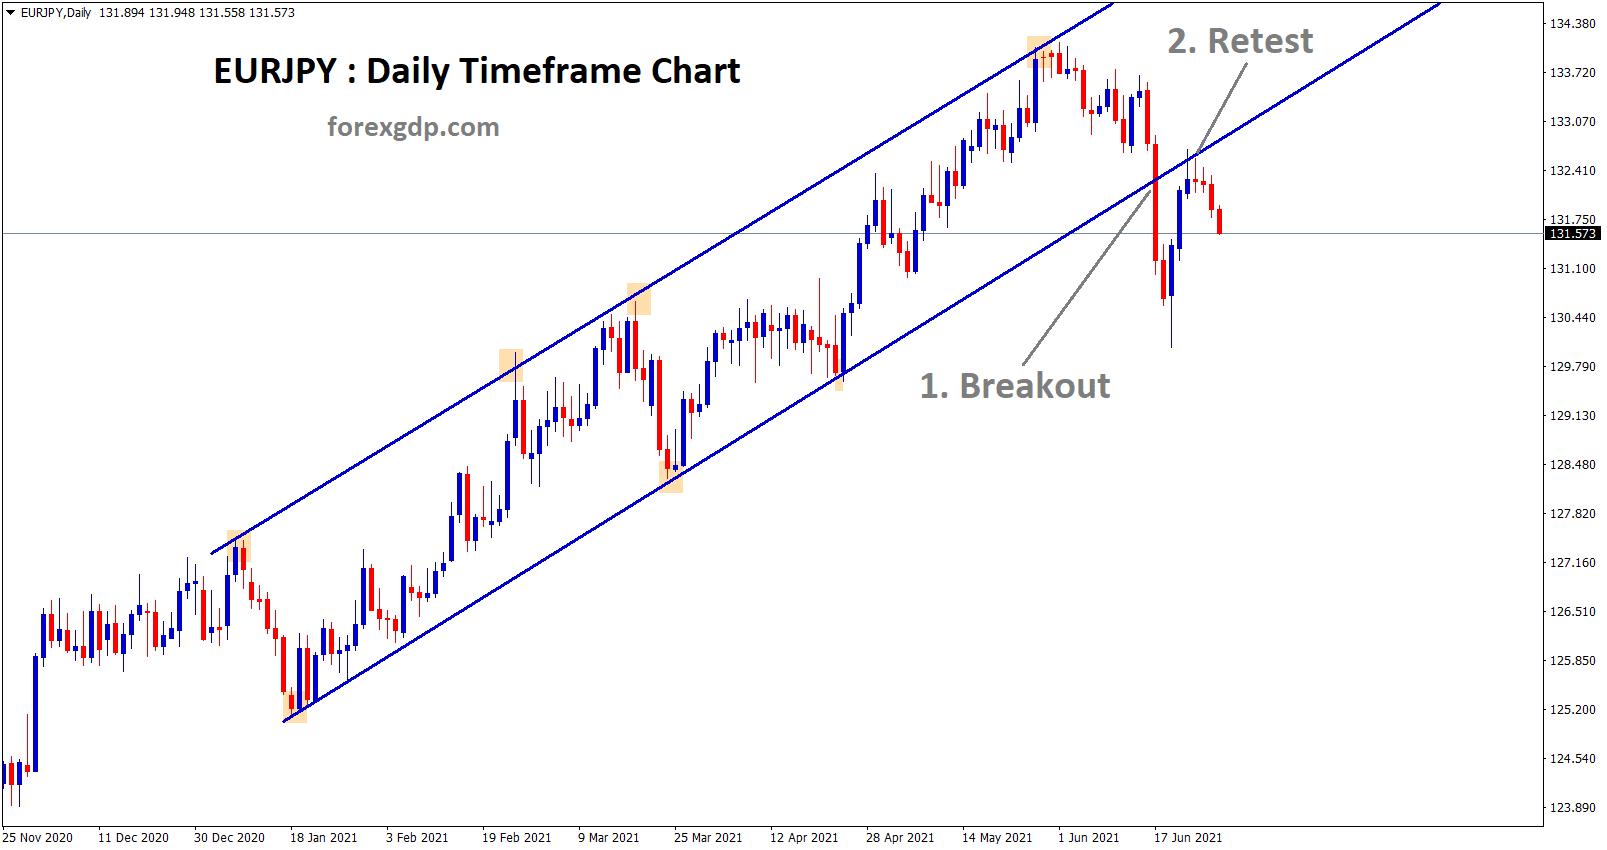 eurjpy breakout and retest of the broken uptrend line